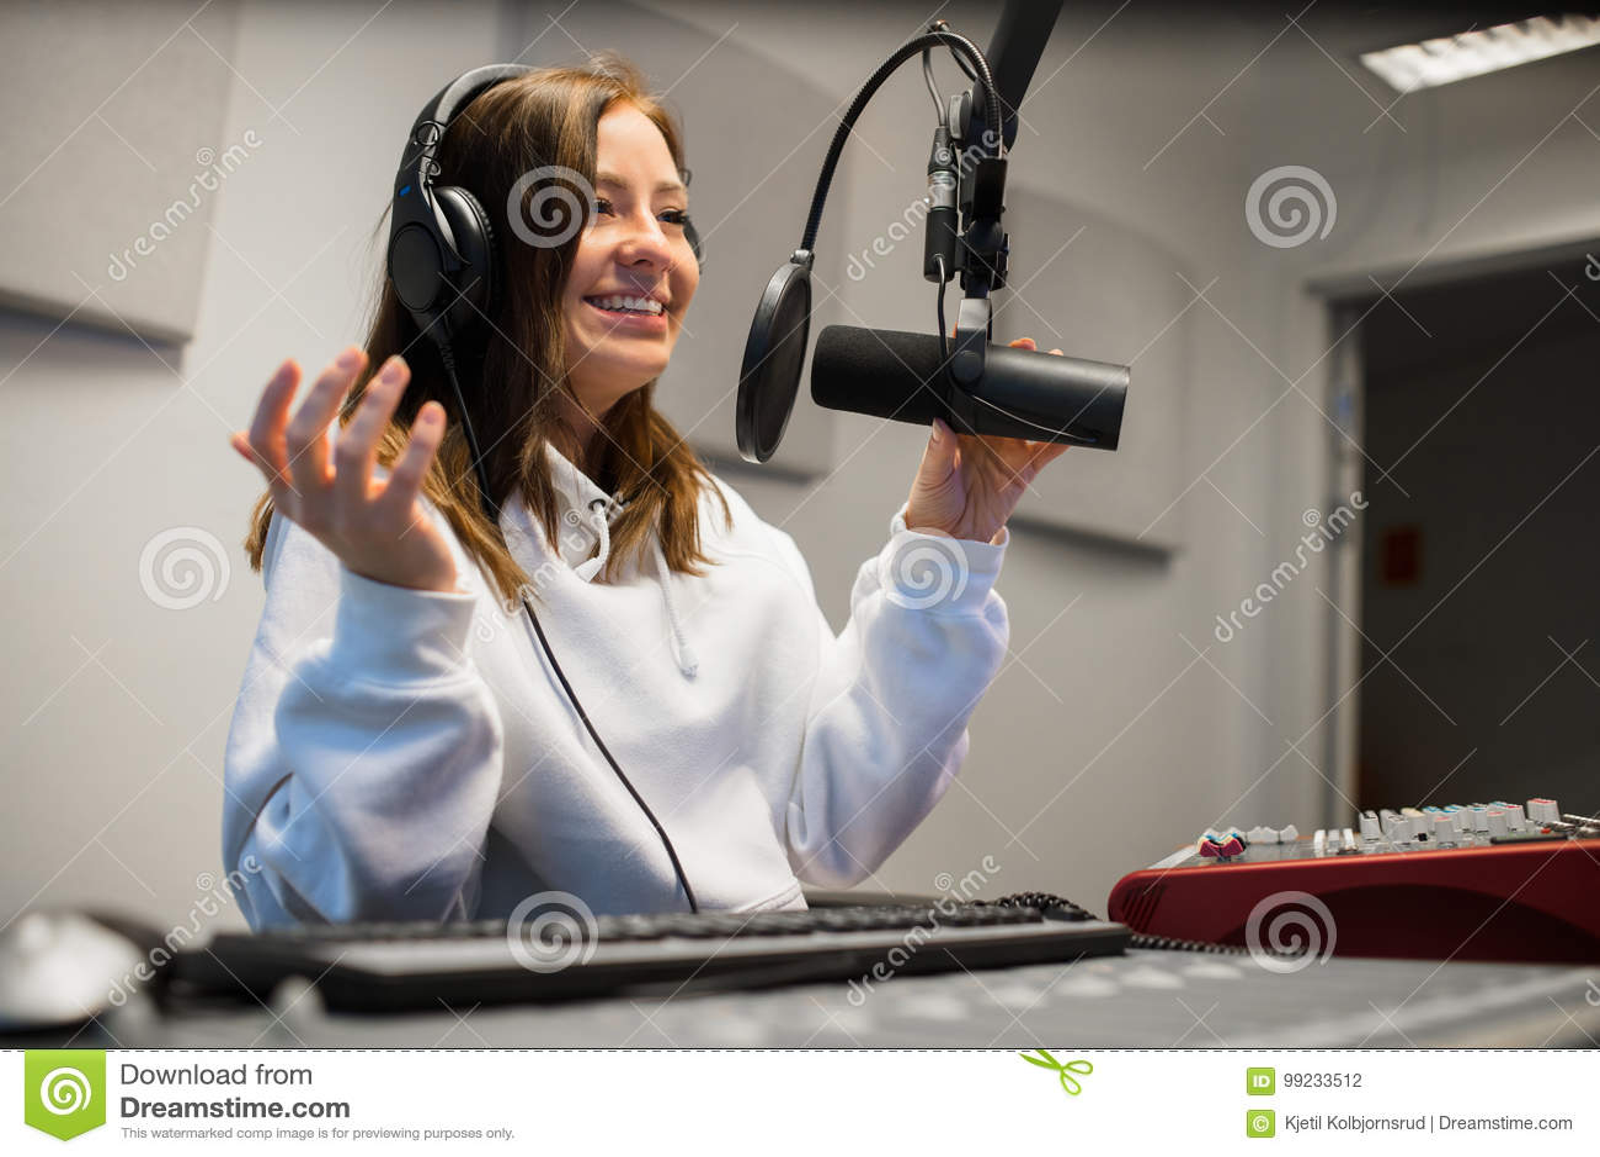 Vrouwelijke Jockey Communicating On Microphone in Radiostudio